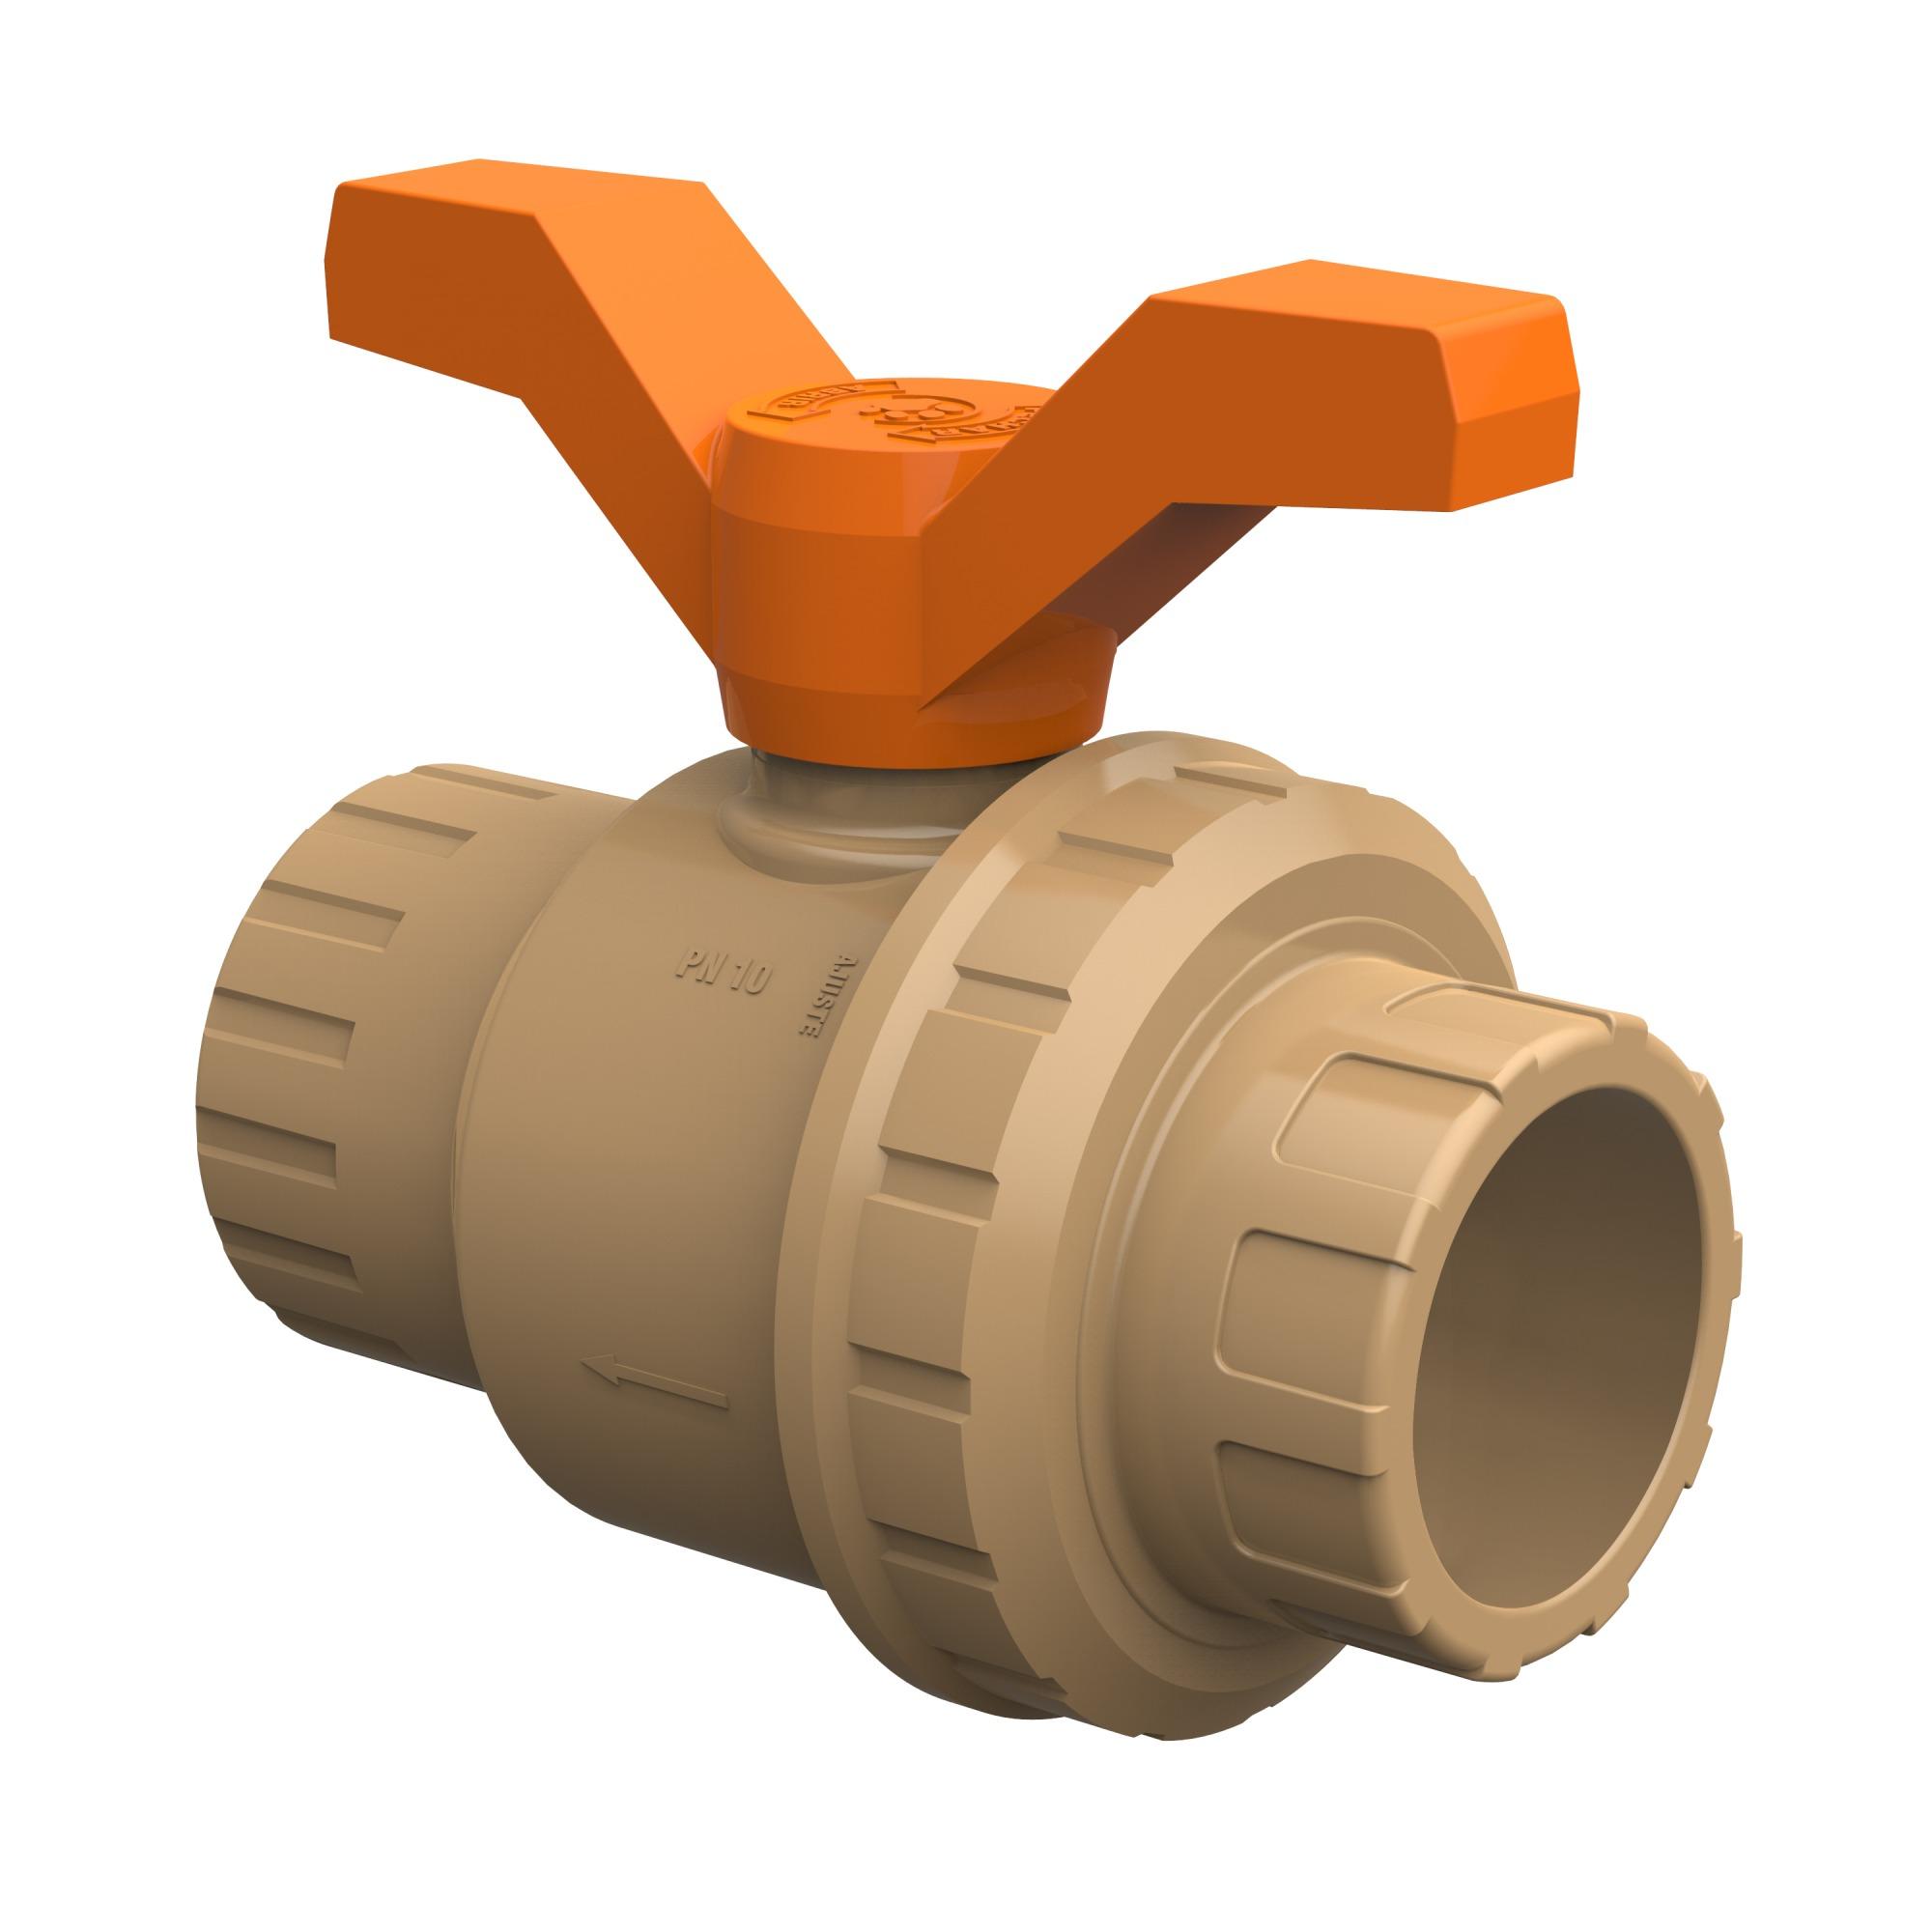 Registro Esfera Soldavel PVC Simples 50mm 27958087 - Tigre